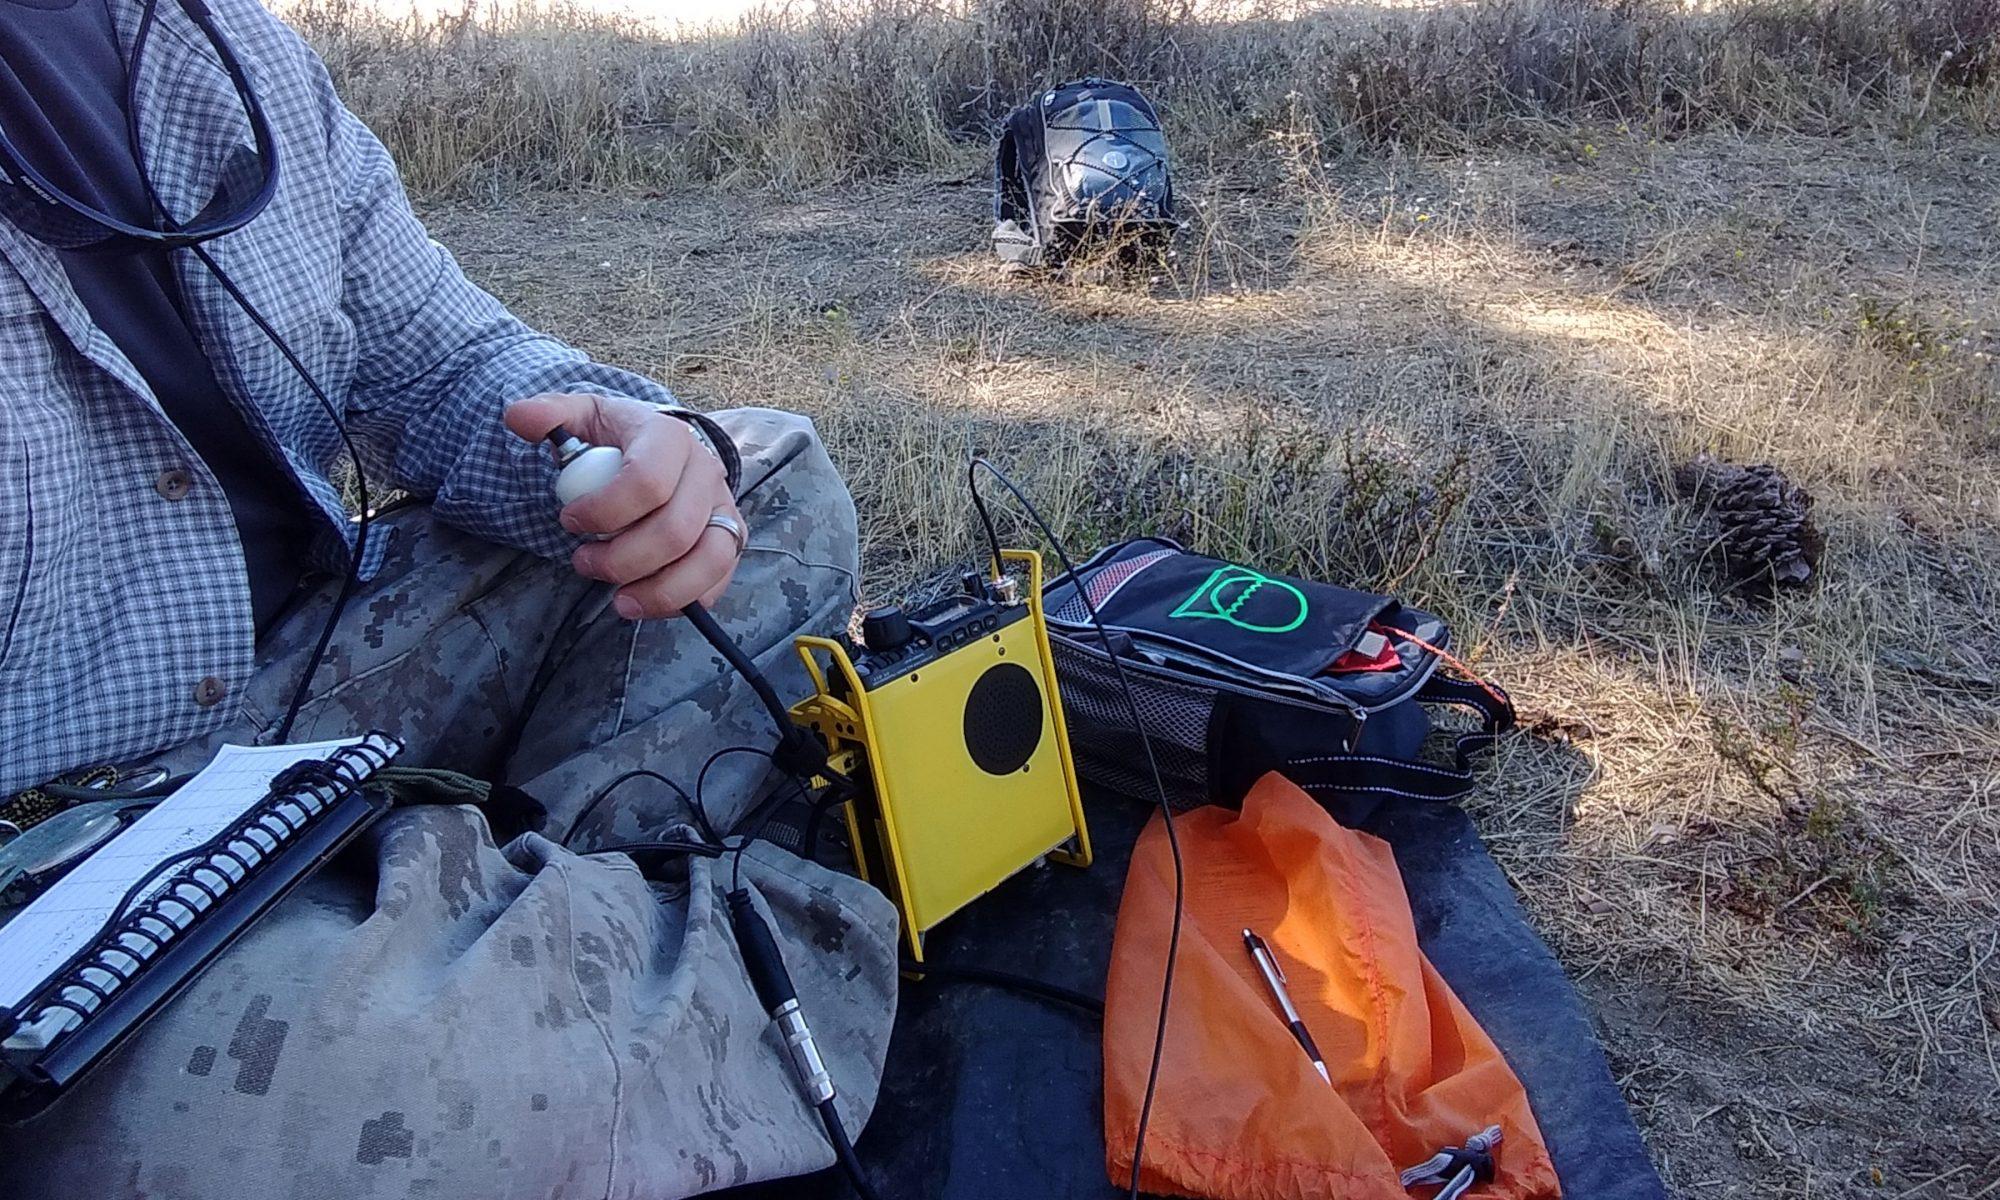 Portable ham radio gear for summits on the air